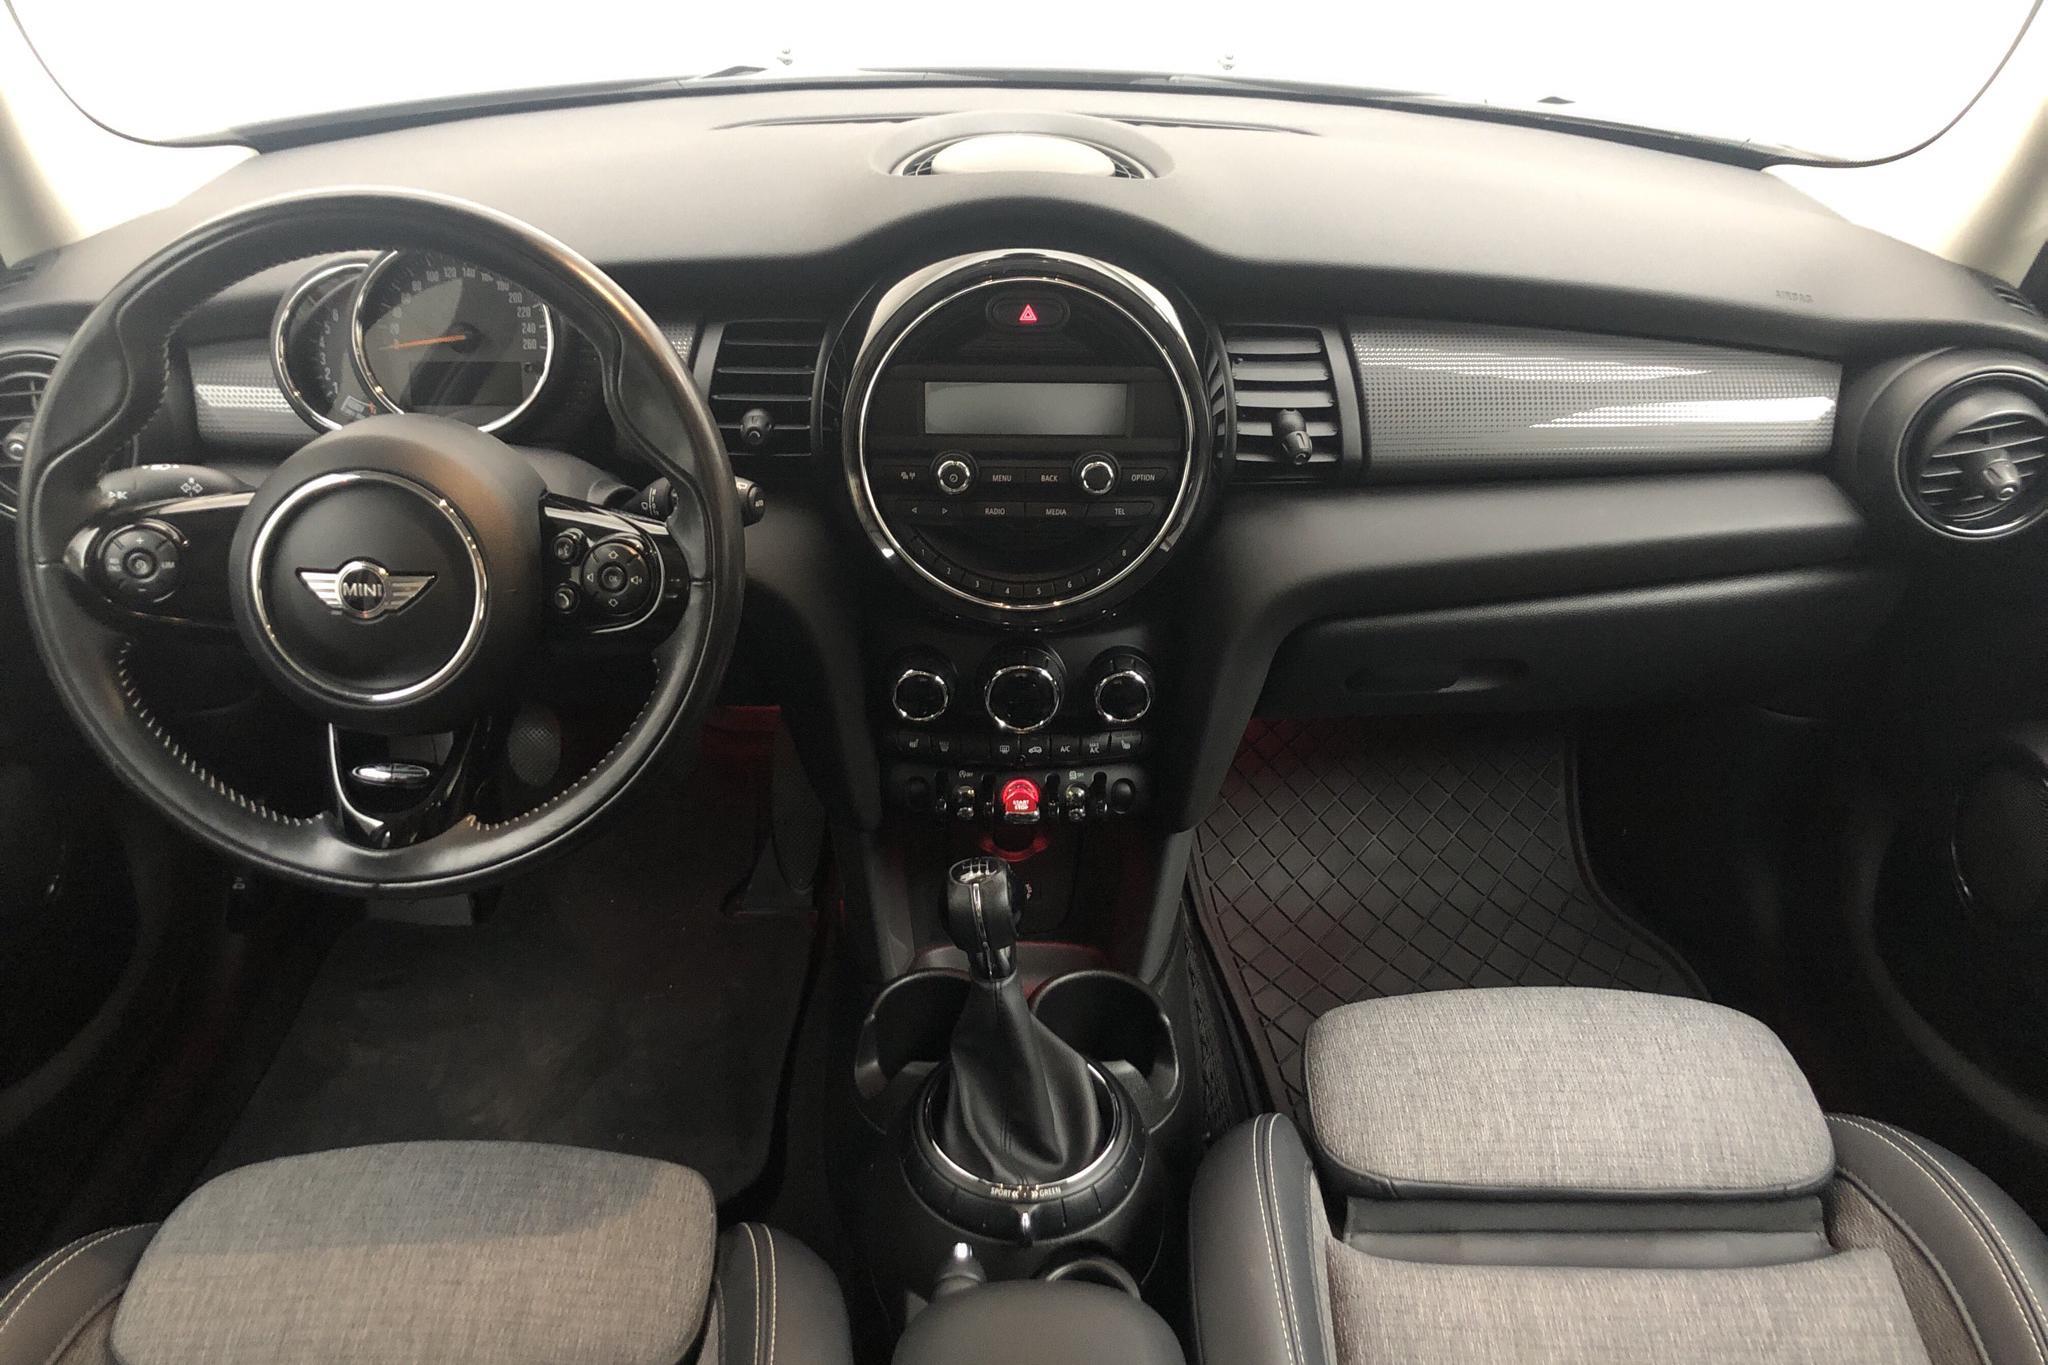 MINI Cooper Hatch 5dr (136hk) - 60 990 km - Manual - black - 2016